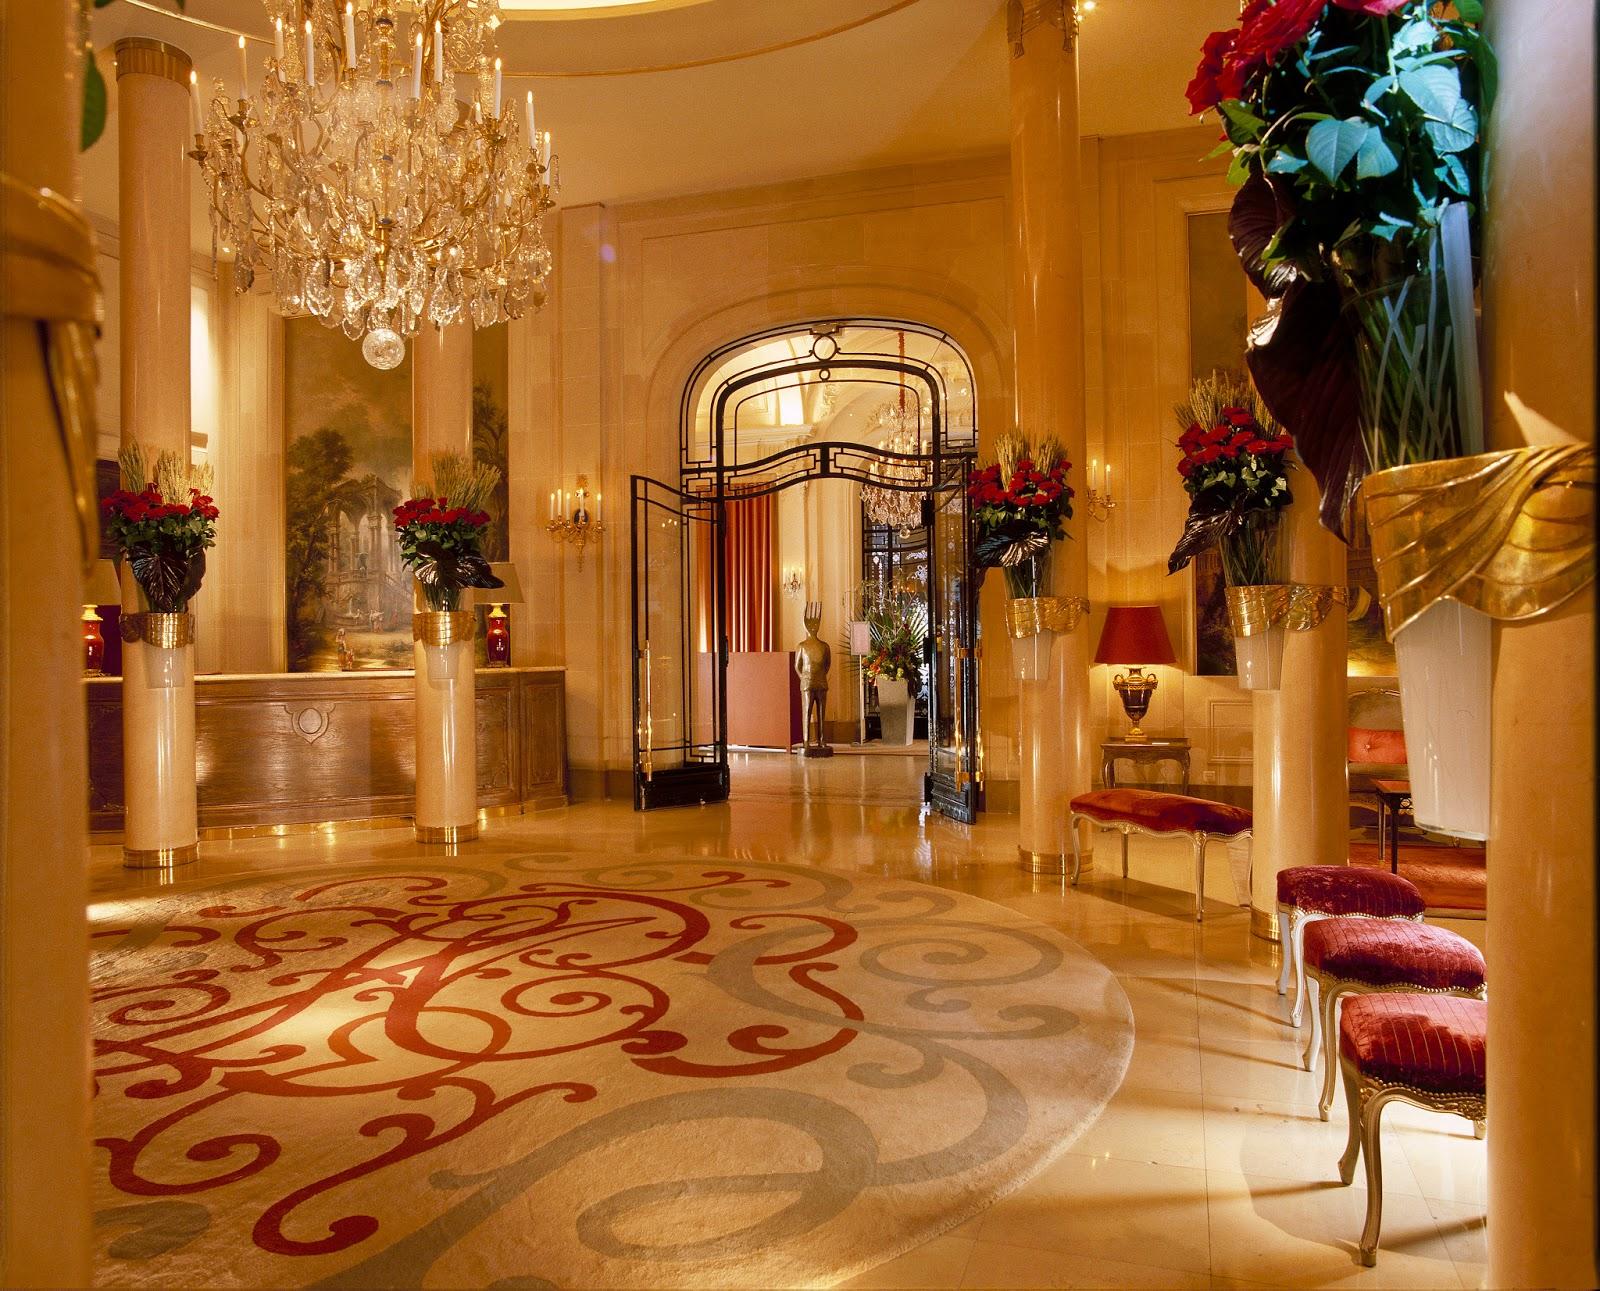 henri luxury lifestyle hotel plaza ath n e paris. Black Bedroom Furniture Sets. Home Design Ideas